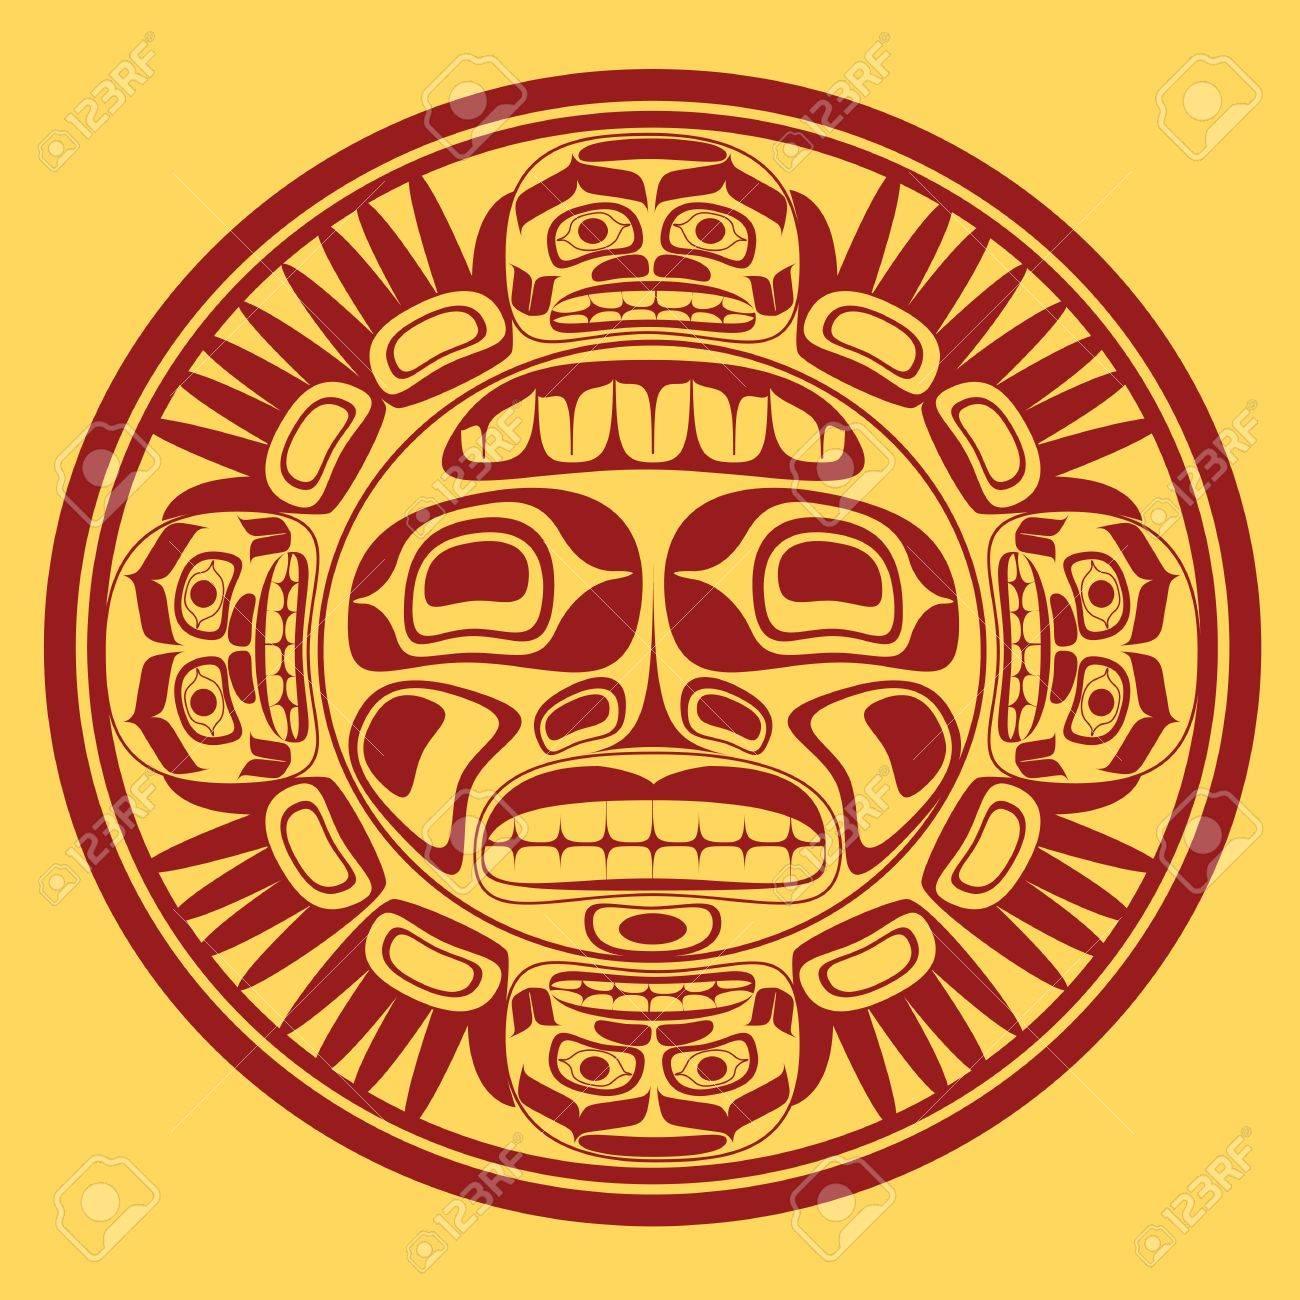 sun symbol, stylization of northwest art Stock Vector - 16803704